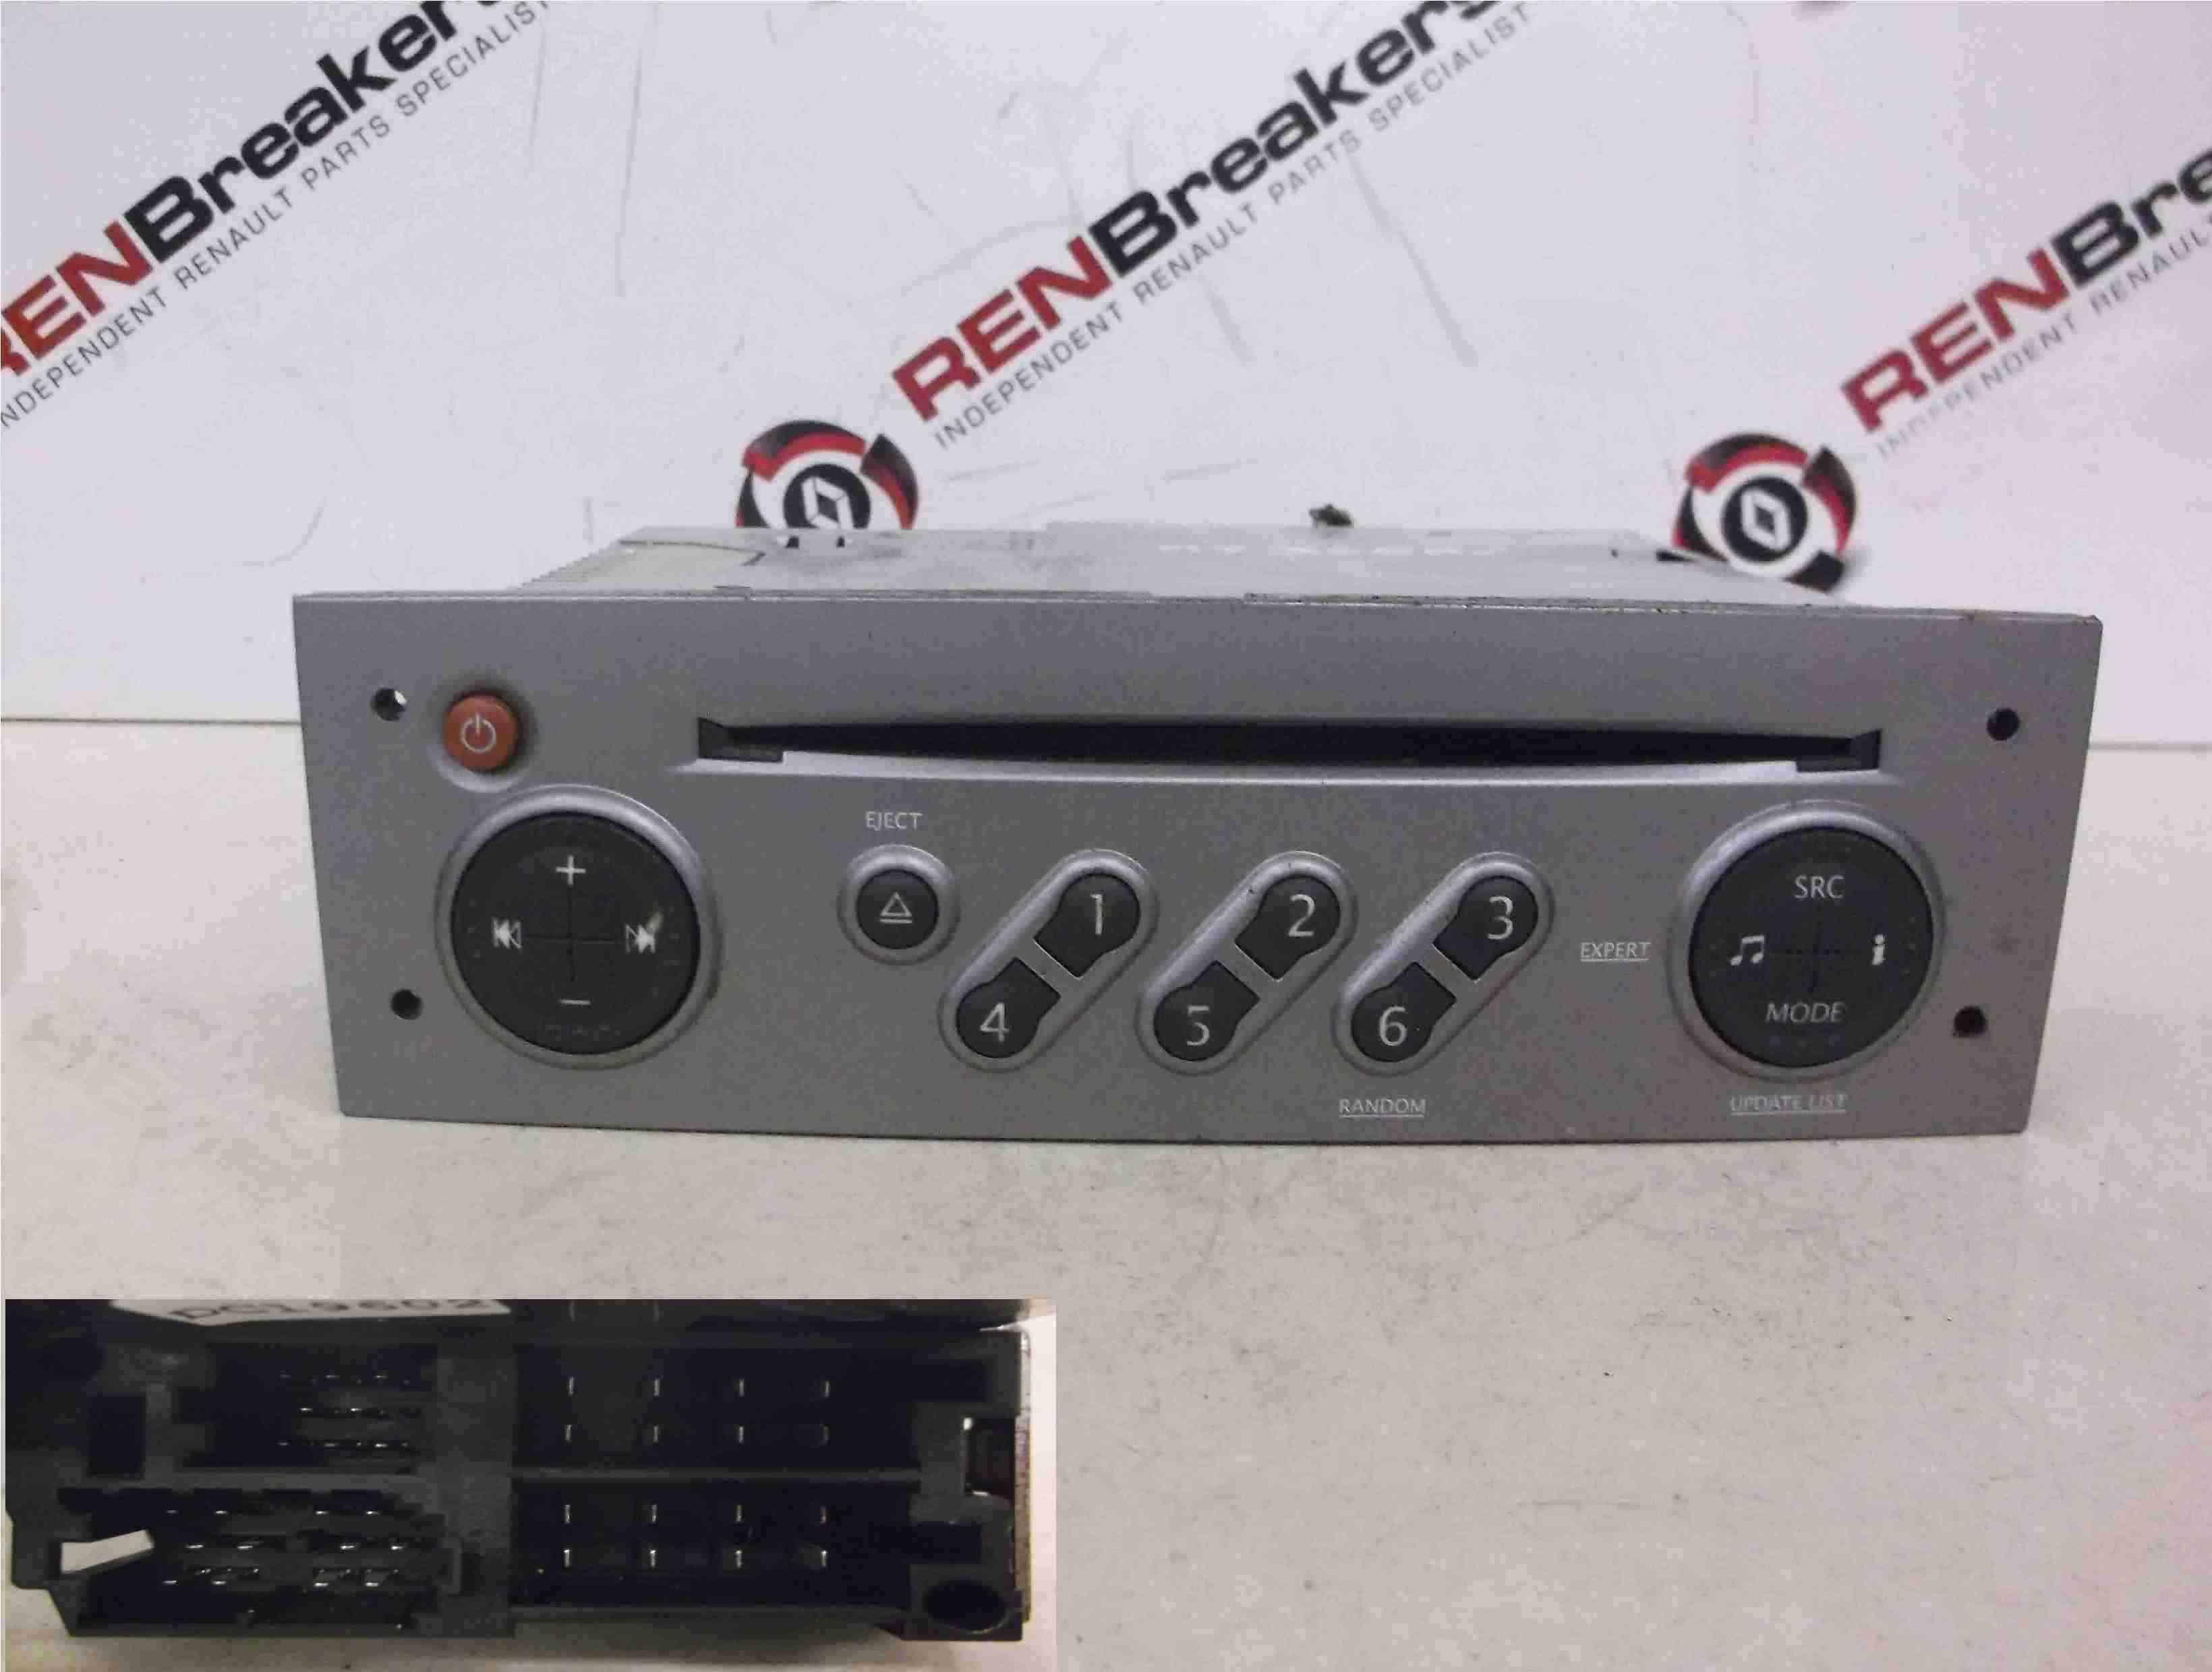 Renault Megane Scenic 2003-2009 Cd Player Radio Update List + Code 8200562686